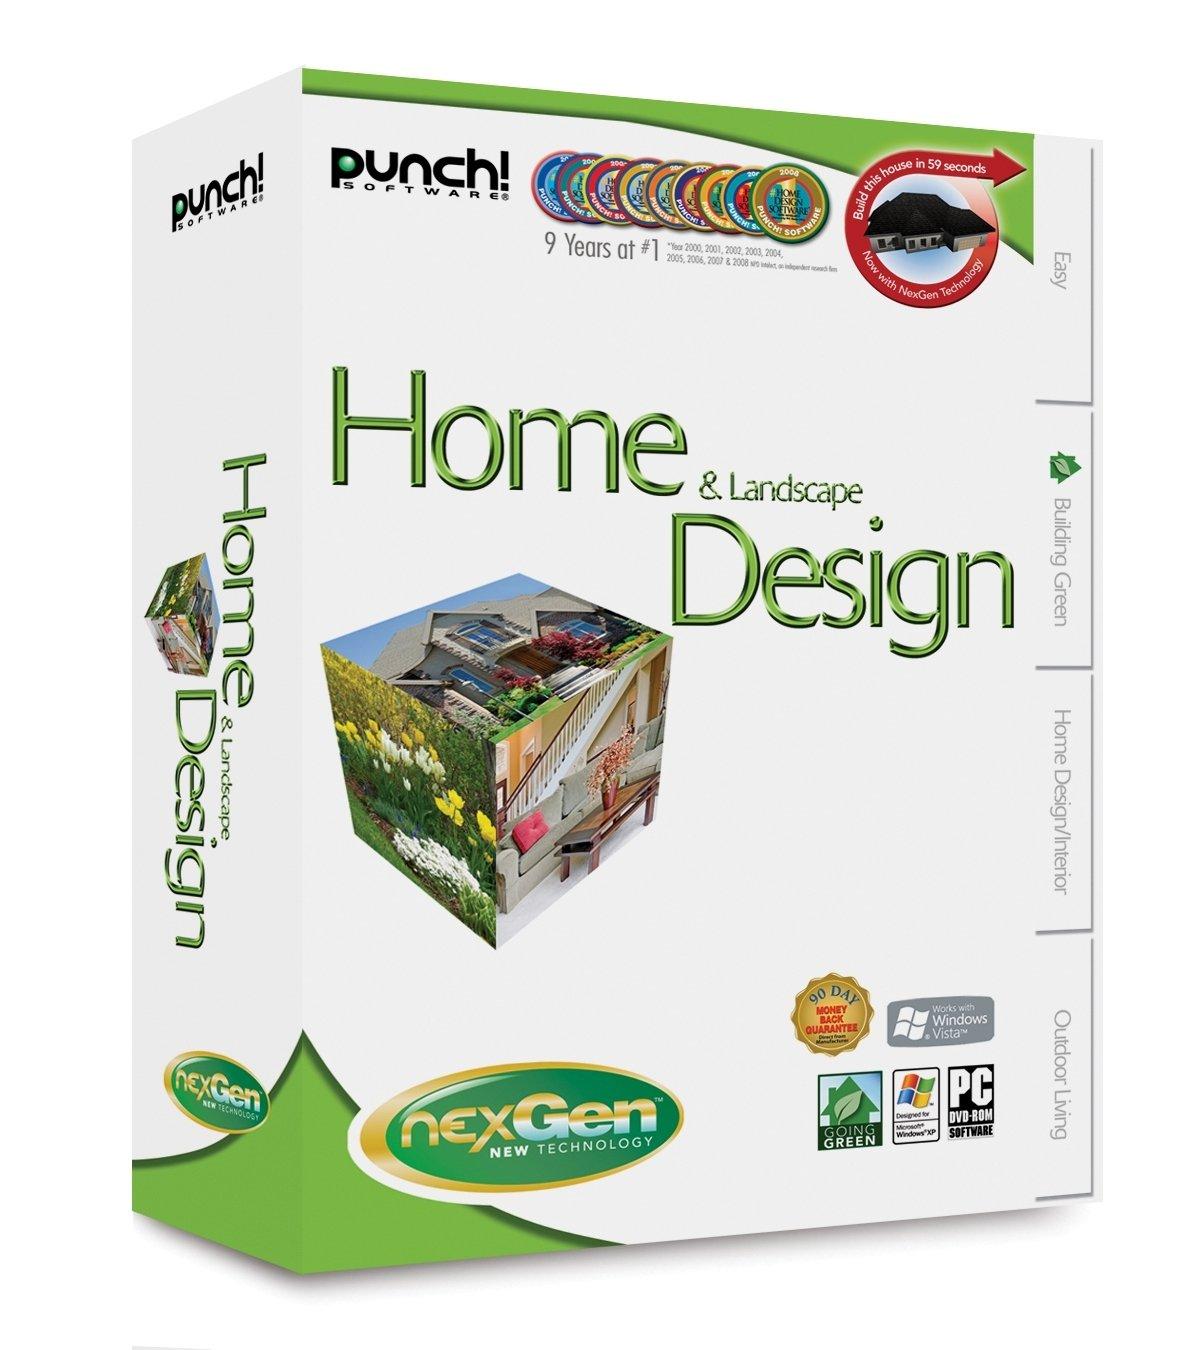 Punch Software Home & Land Design With NEXGEN Technology